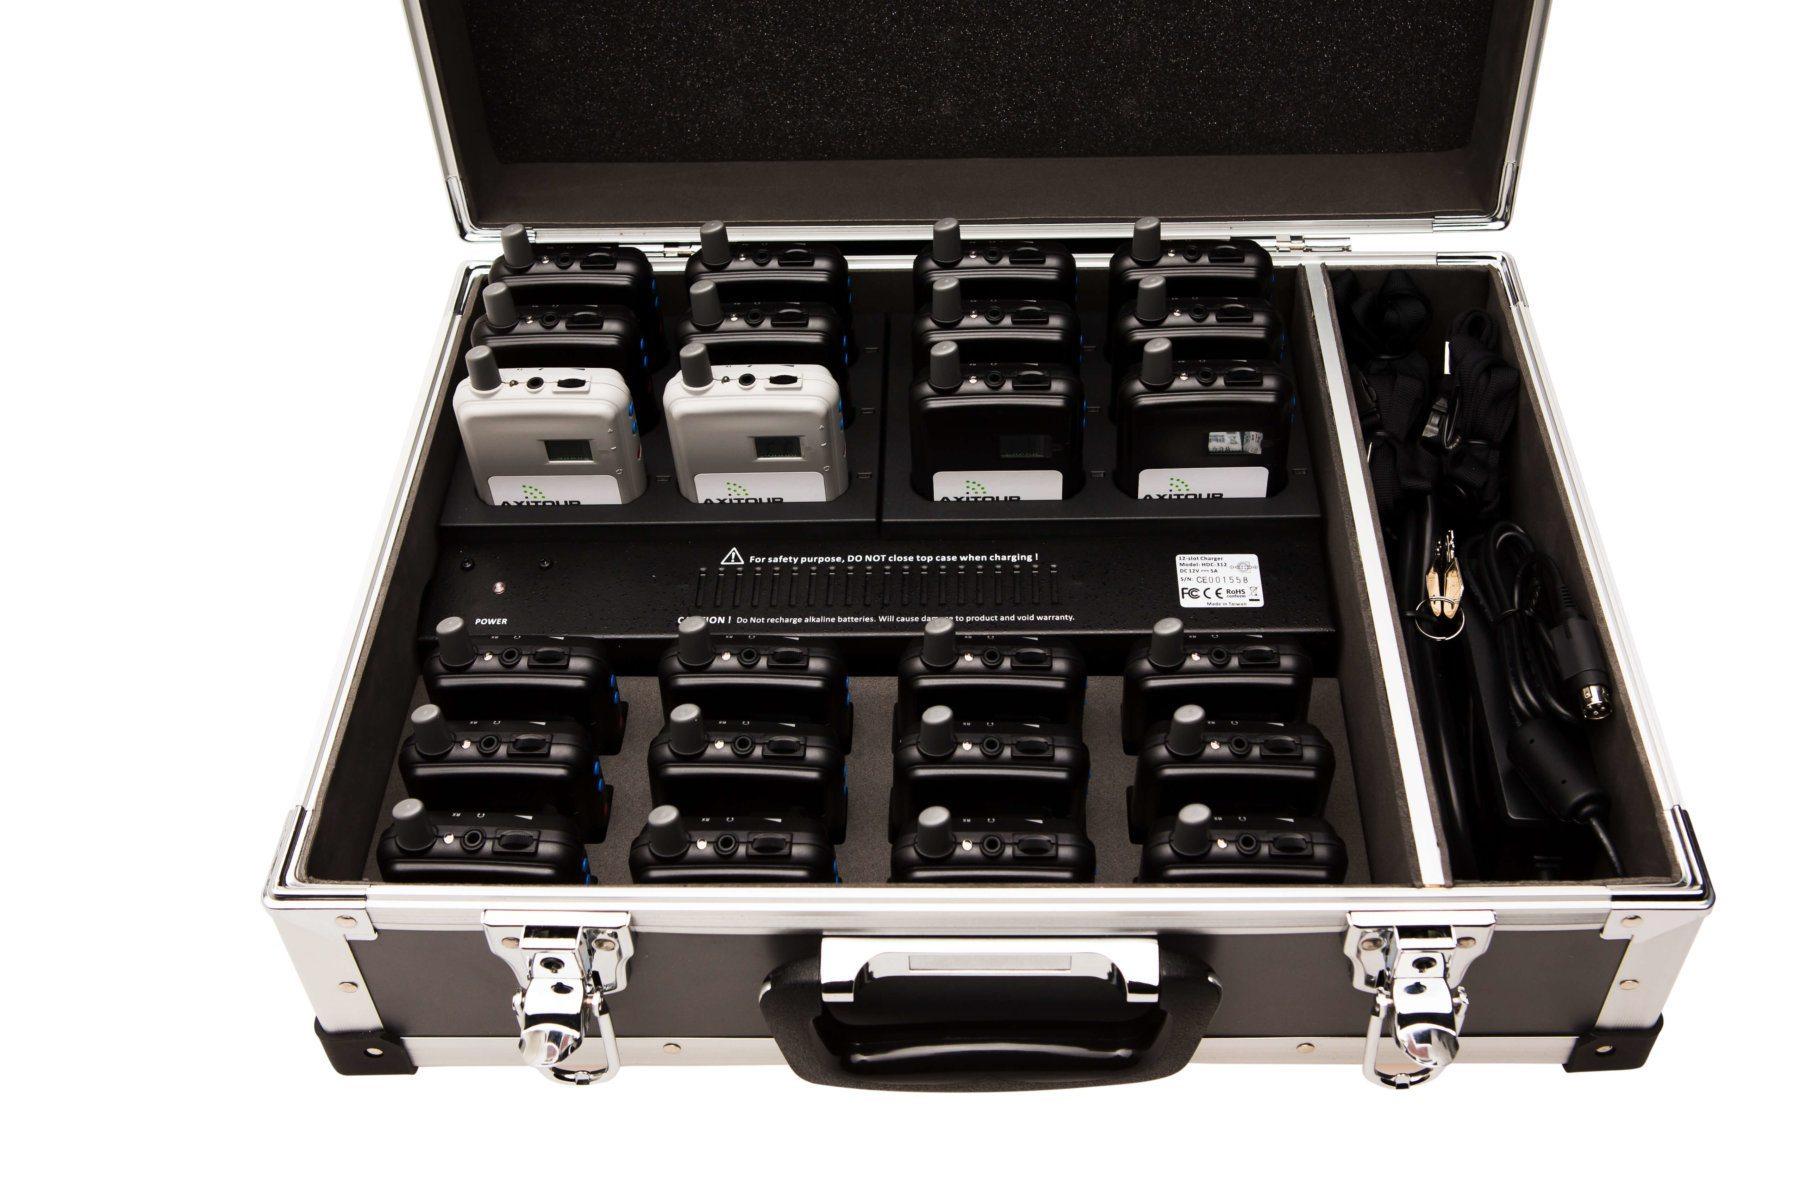 axitour-at-300-communicatie-systeem-binnenkant